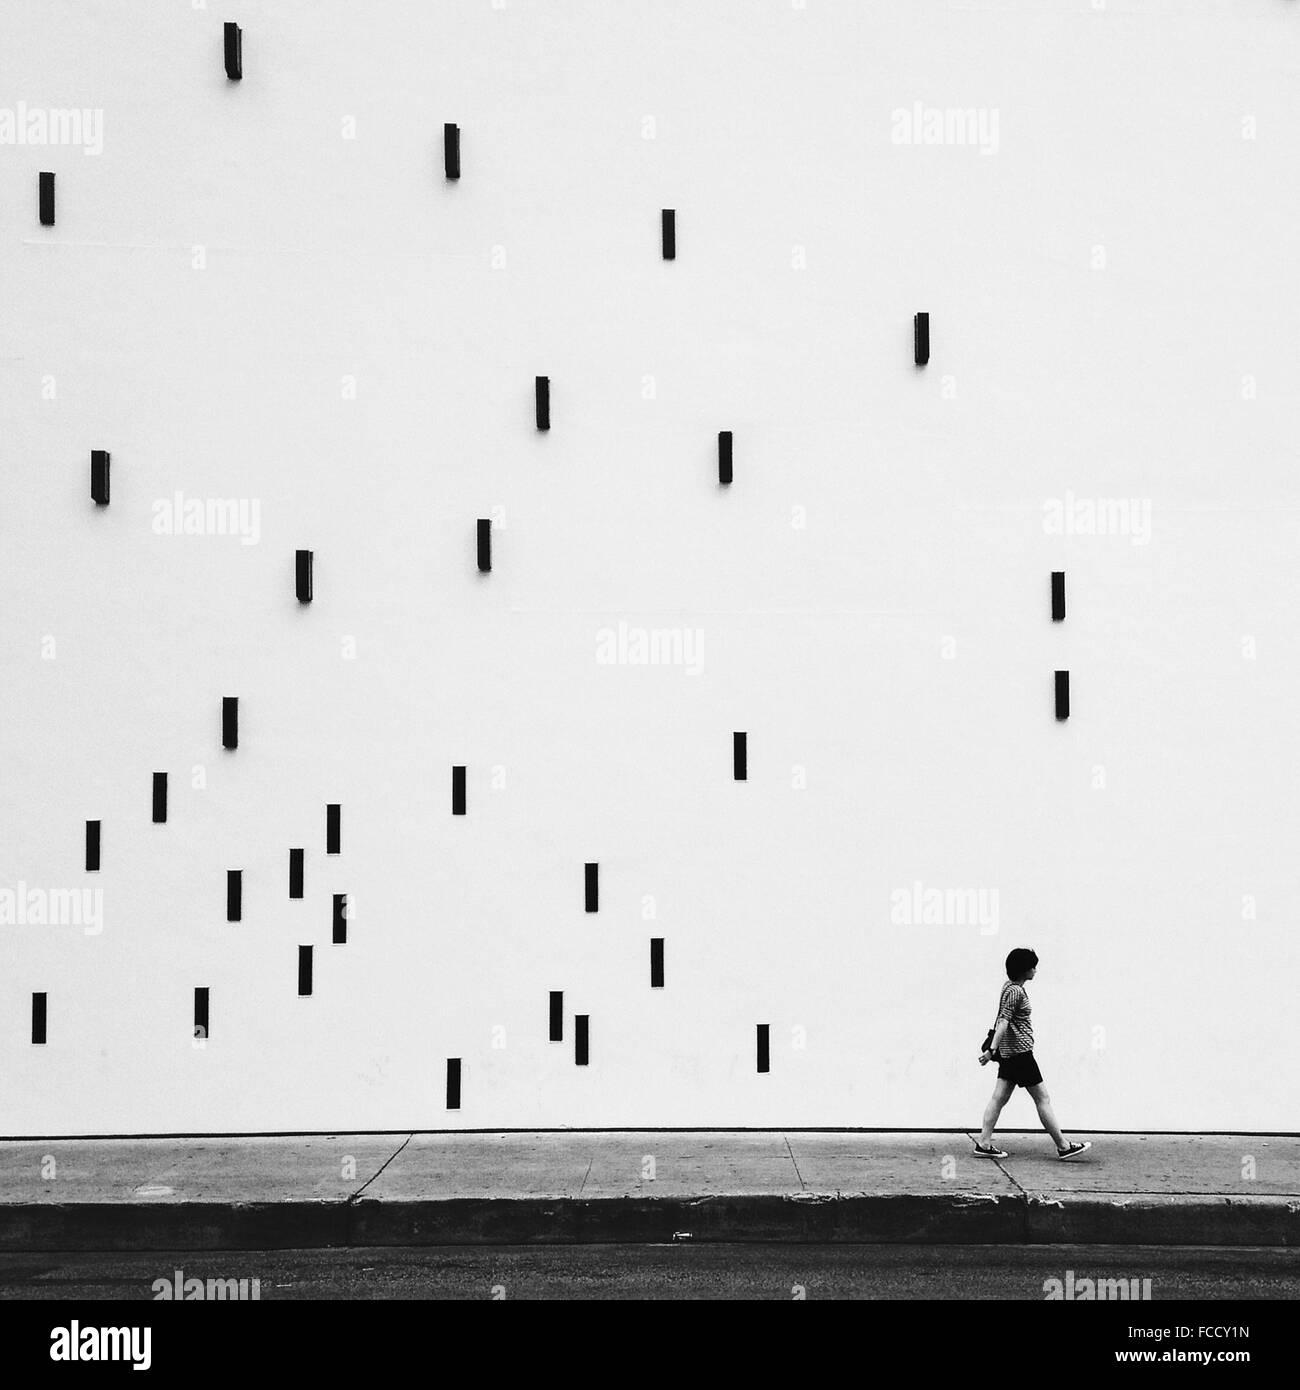 Man Walking On Sidewalk By Artistic Wall - Stock Image